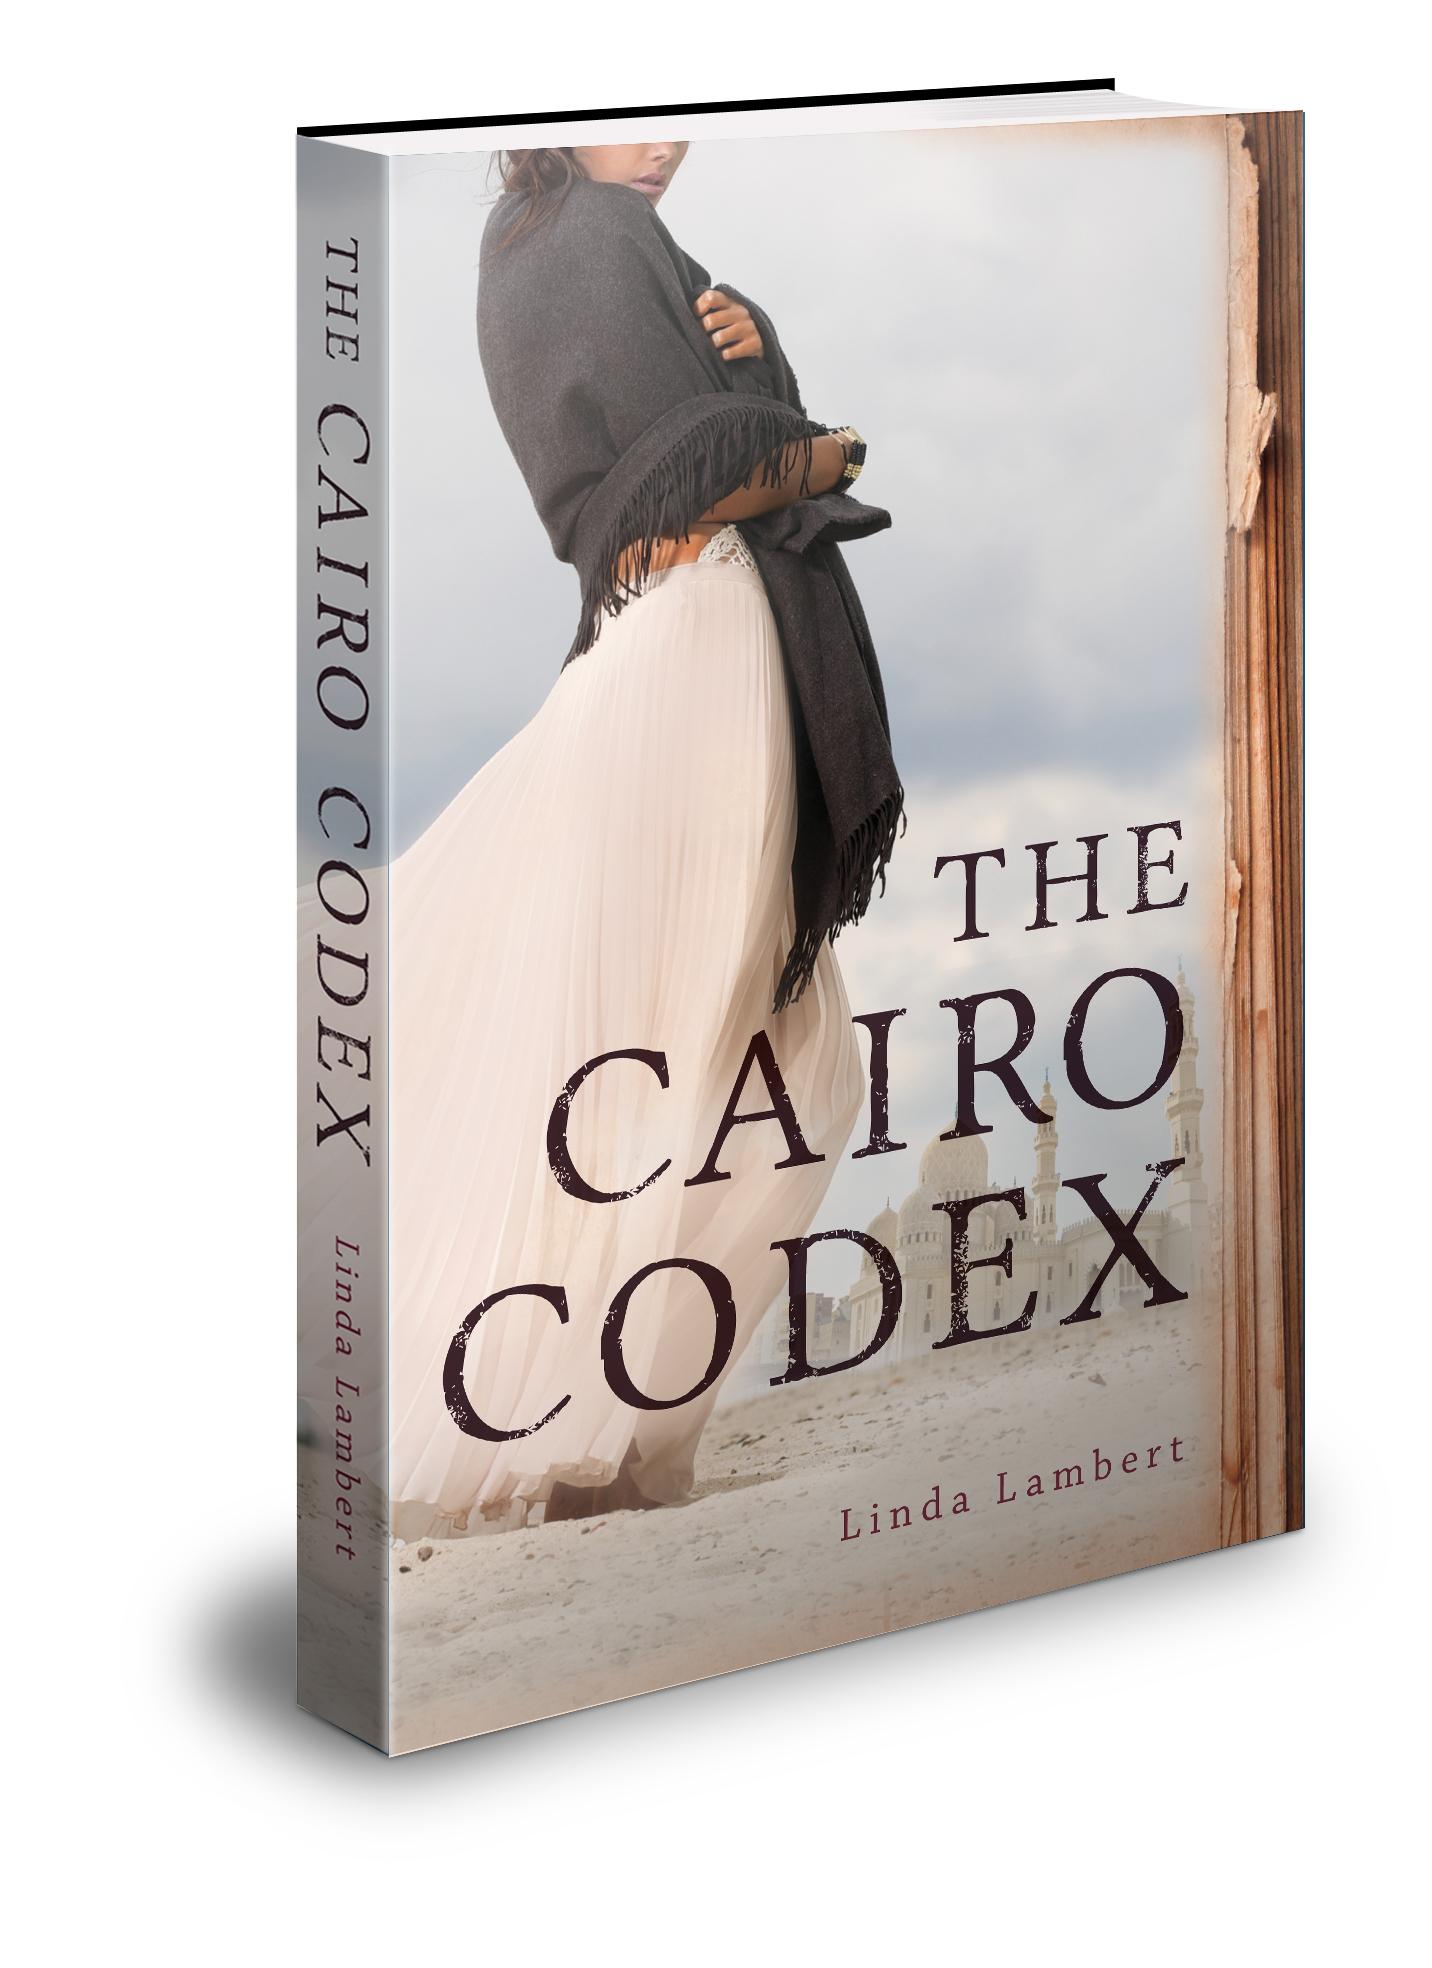 http://westhillspress.com/cairo-diary/